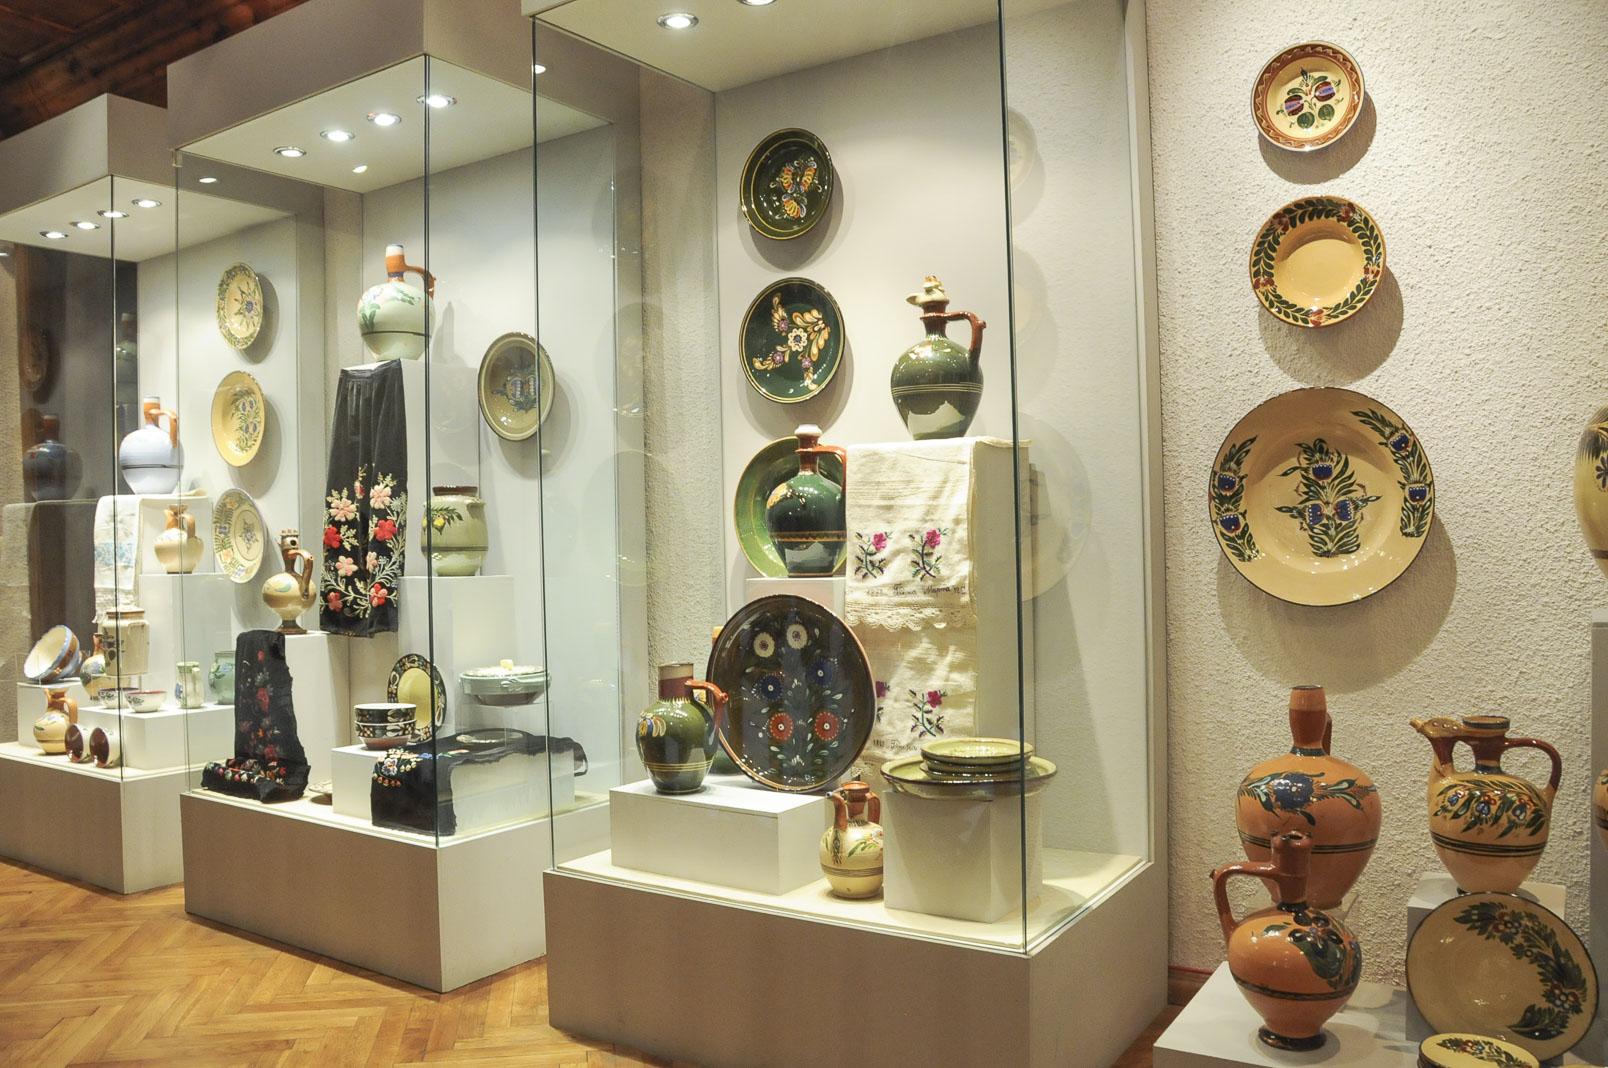 troyan-museum-cvetqta-na-zografa-9